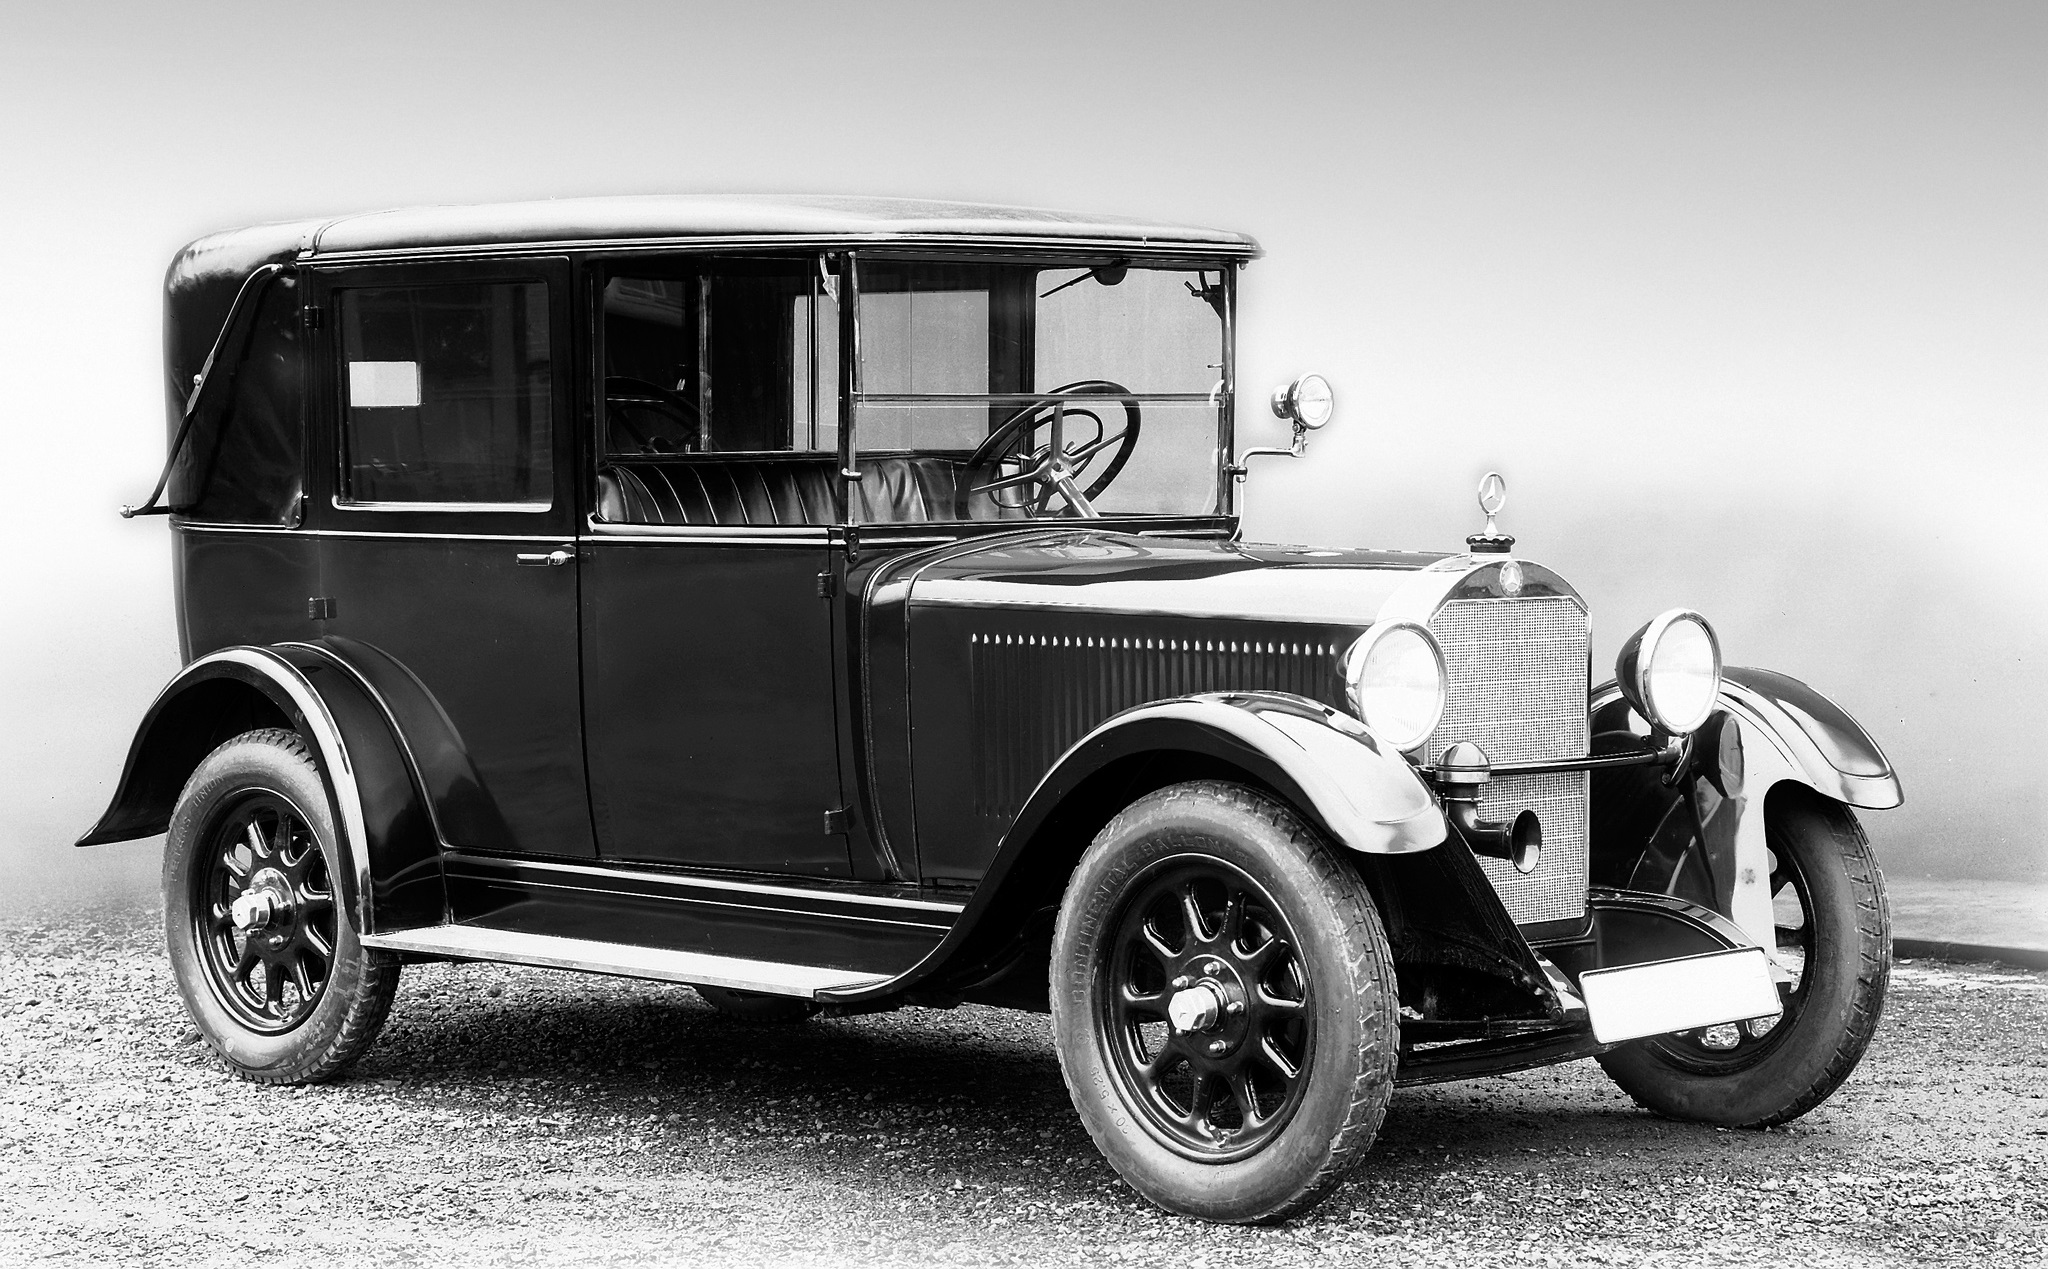 TAXI Mercedes-Benz 8-38 HP Landaulet Taxi 1926